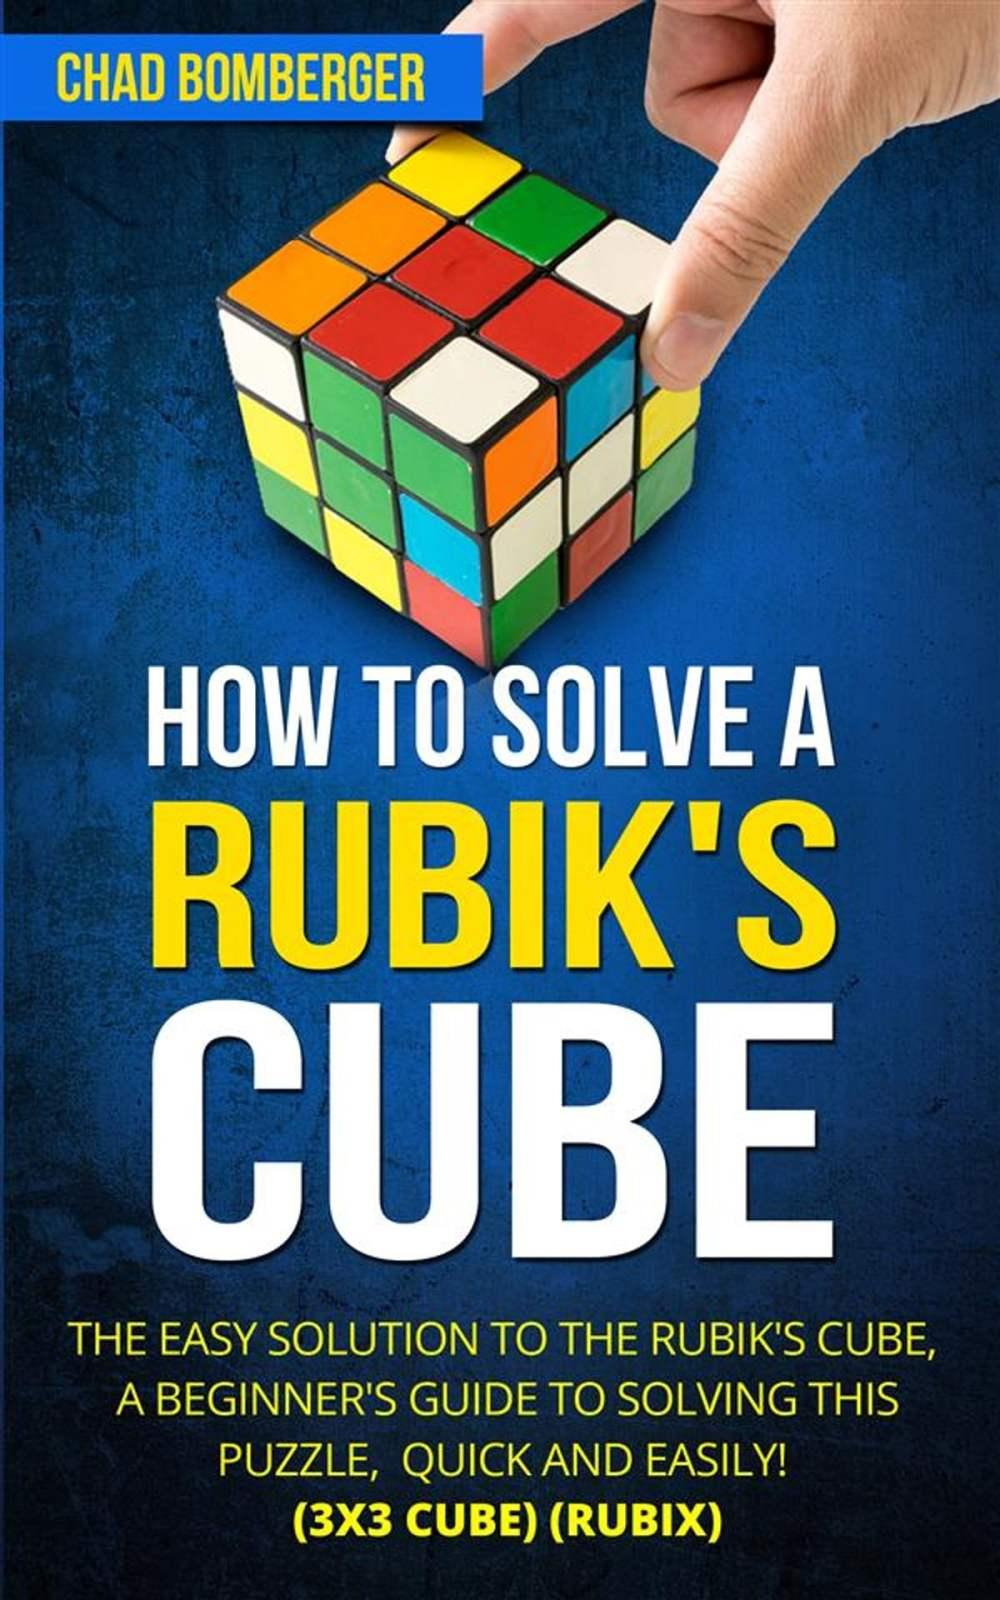 medium resolution of how to solve a rubik s cube ebook by chad bomberger 9781641868228 rakuten kobo